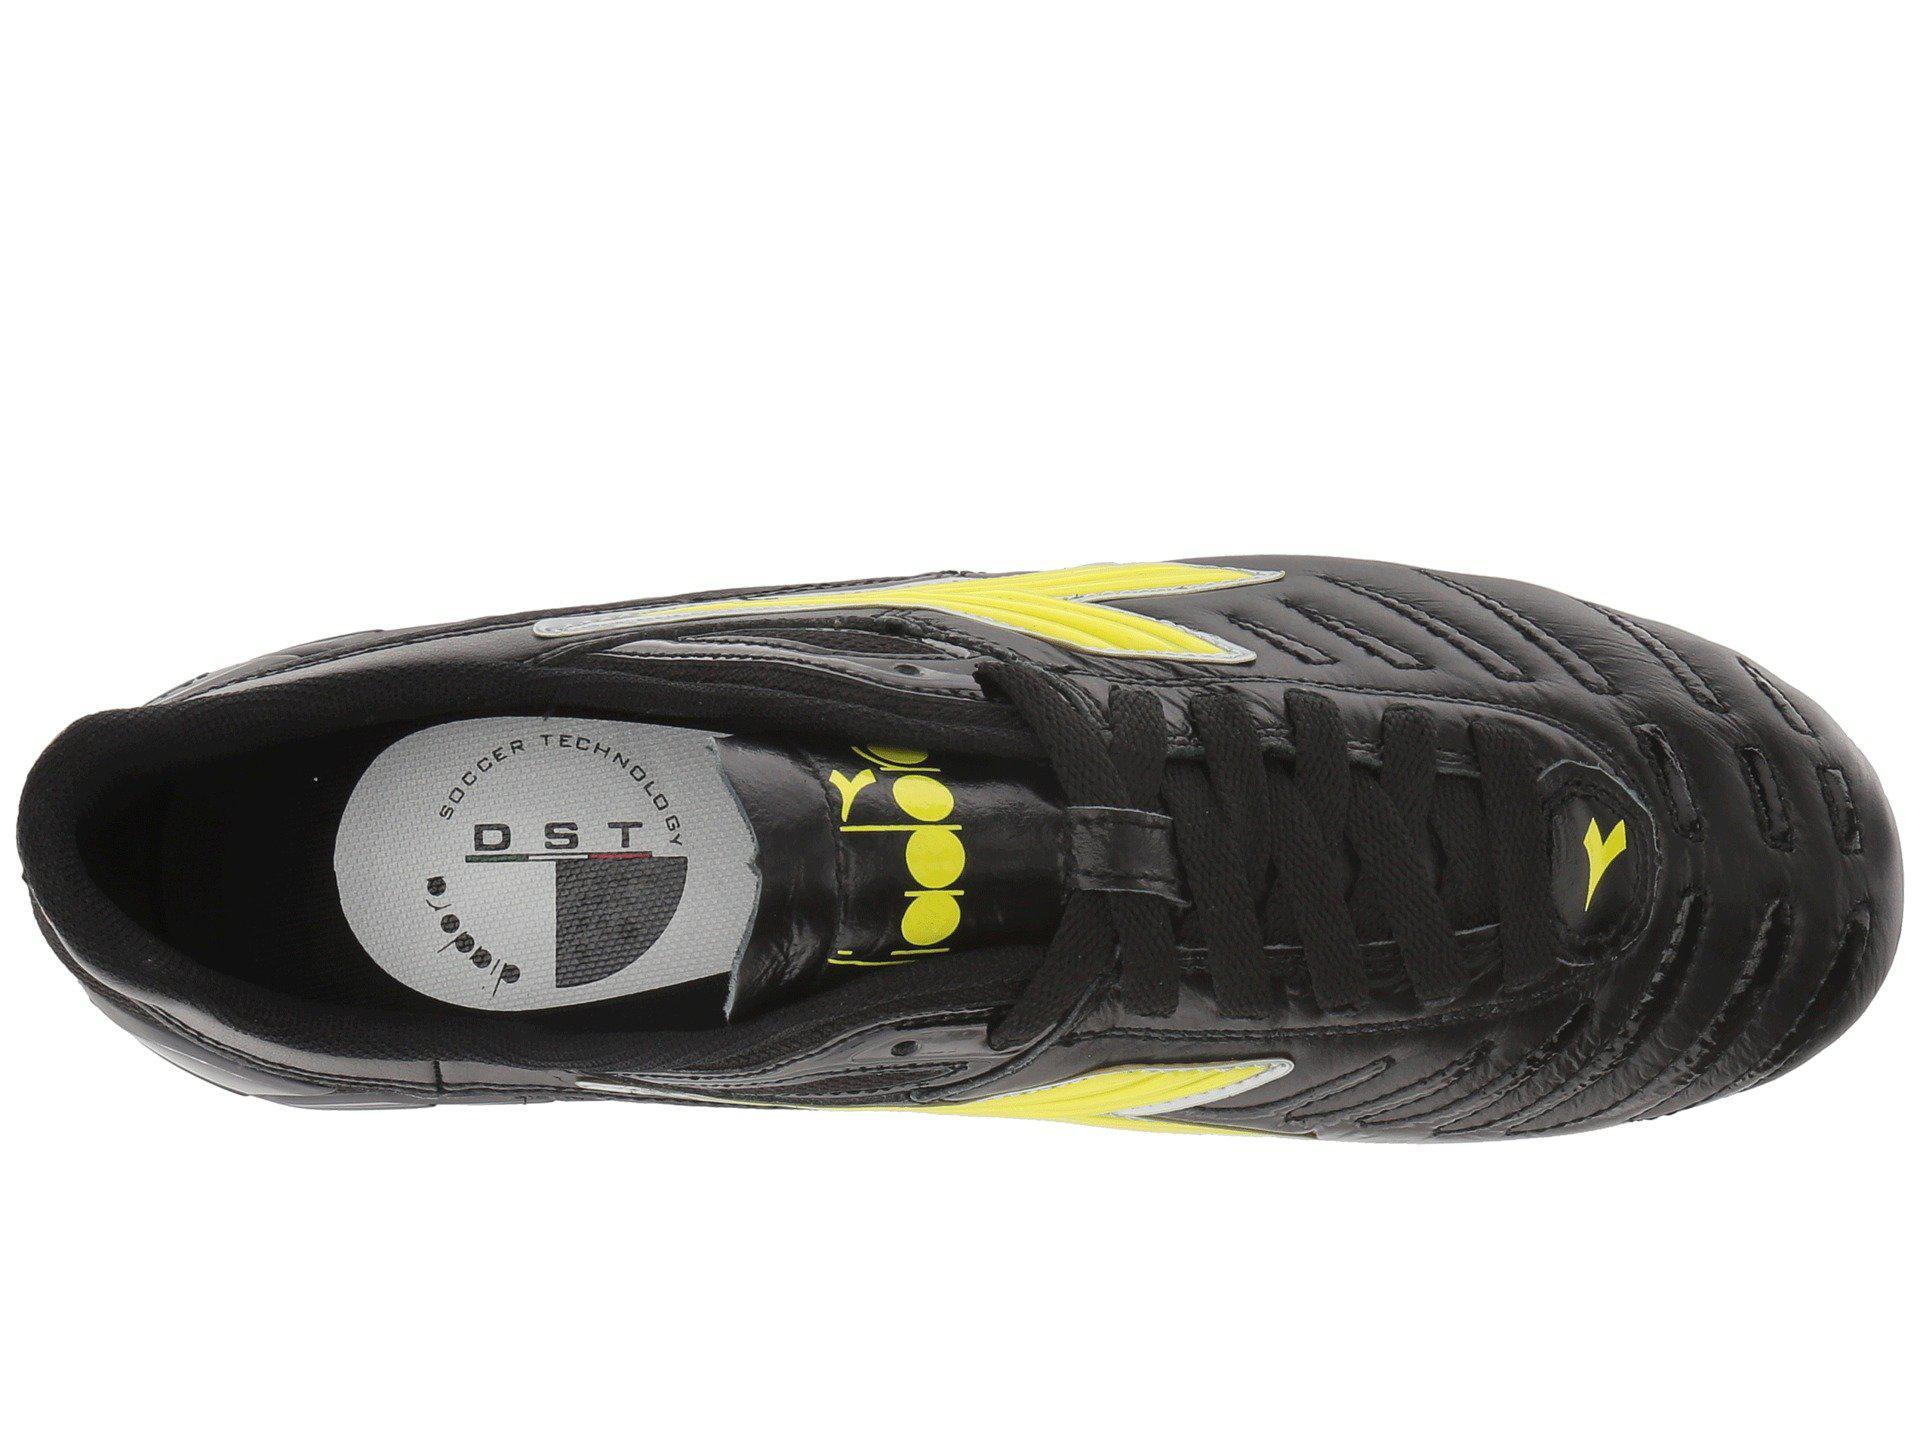 f24866d32 Diadora Maracana 18 W (black fluo Yellow) Women s Soccer Shoes in ...